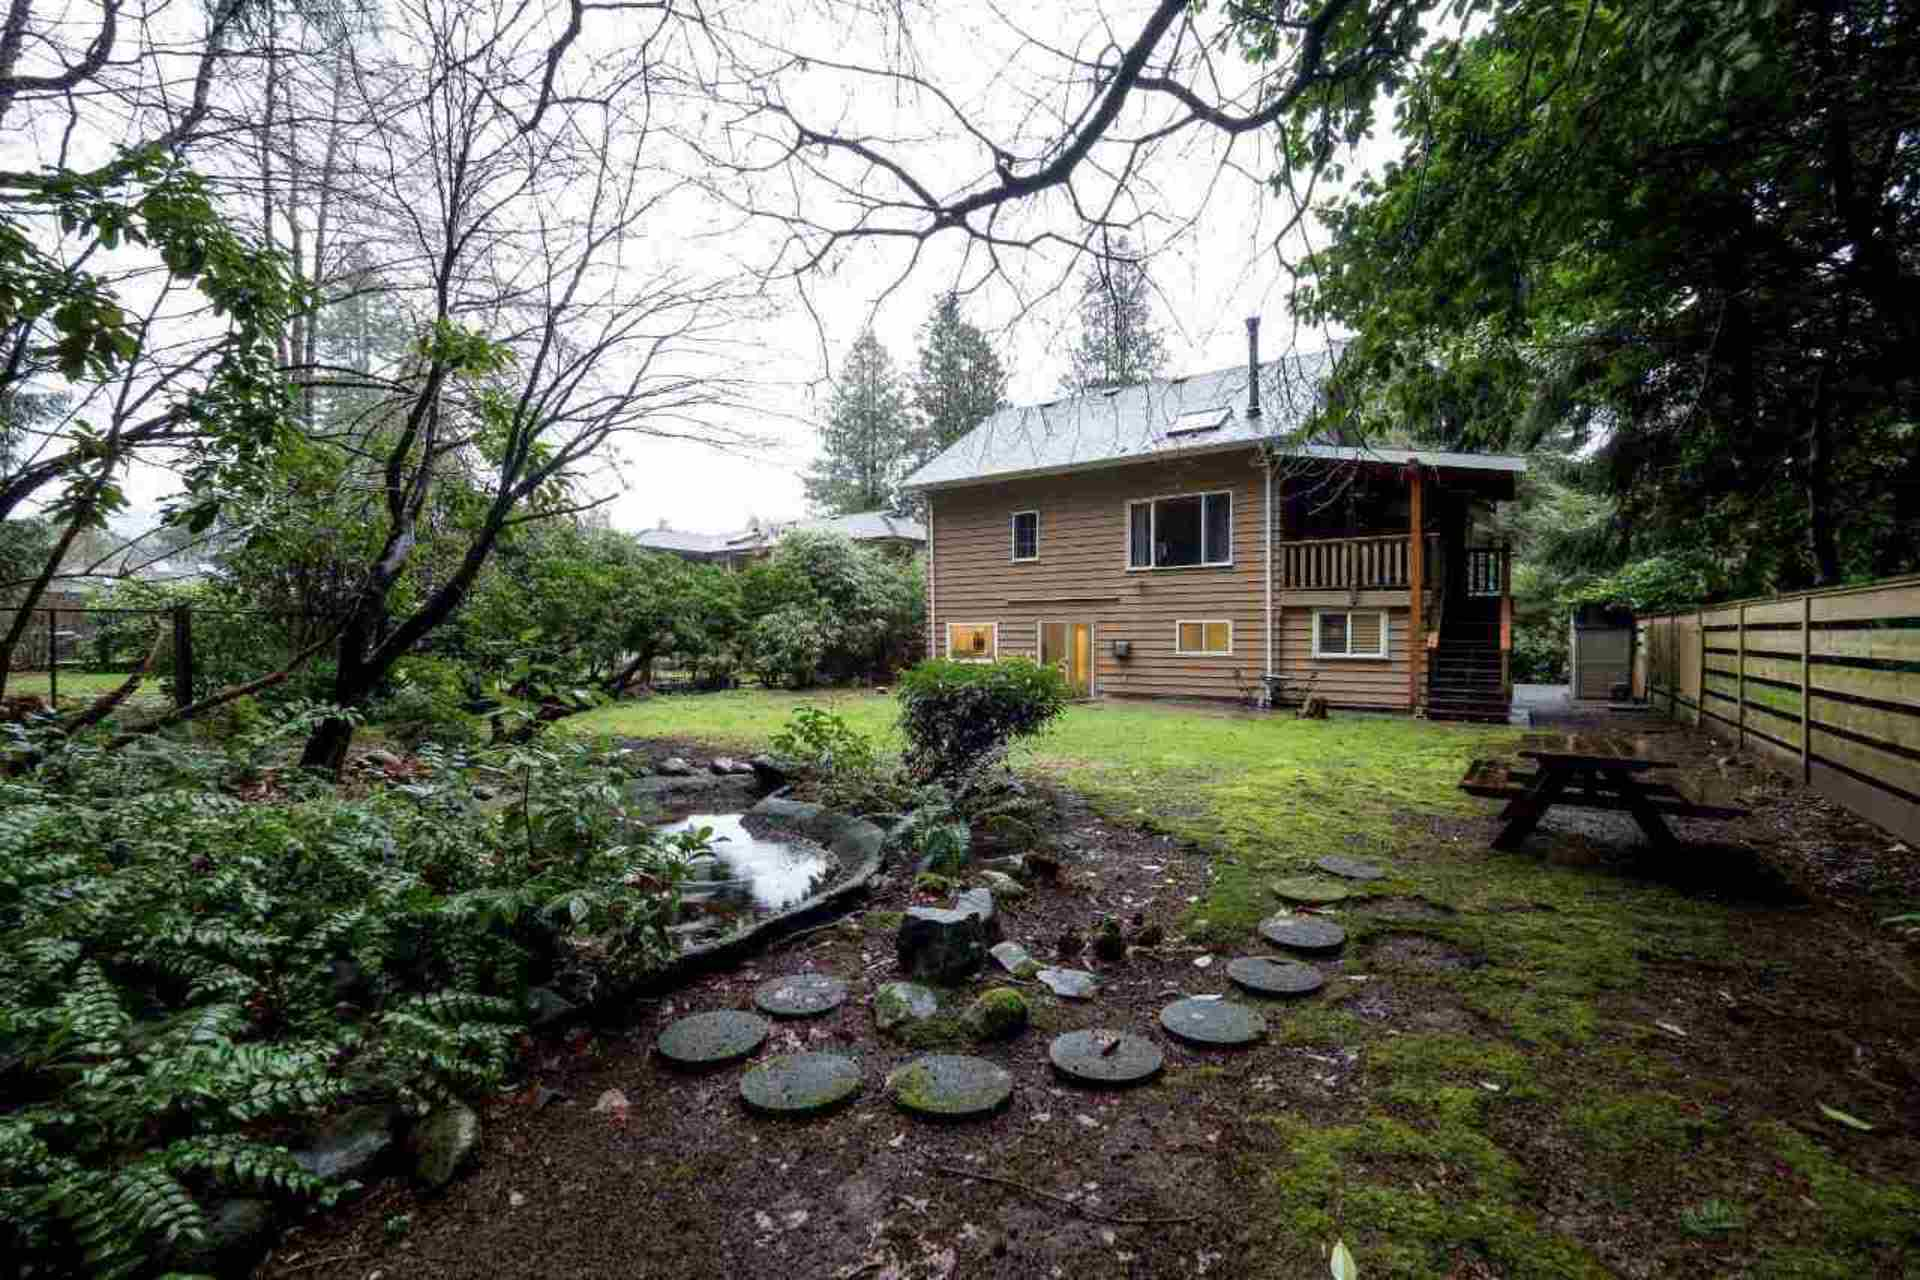 3219-allan-road-lynn-valley-north-vancouver-17 at 3219 Allan Road, Lynn Valley, North Vancouver